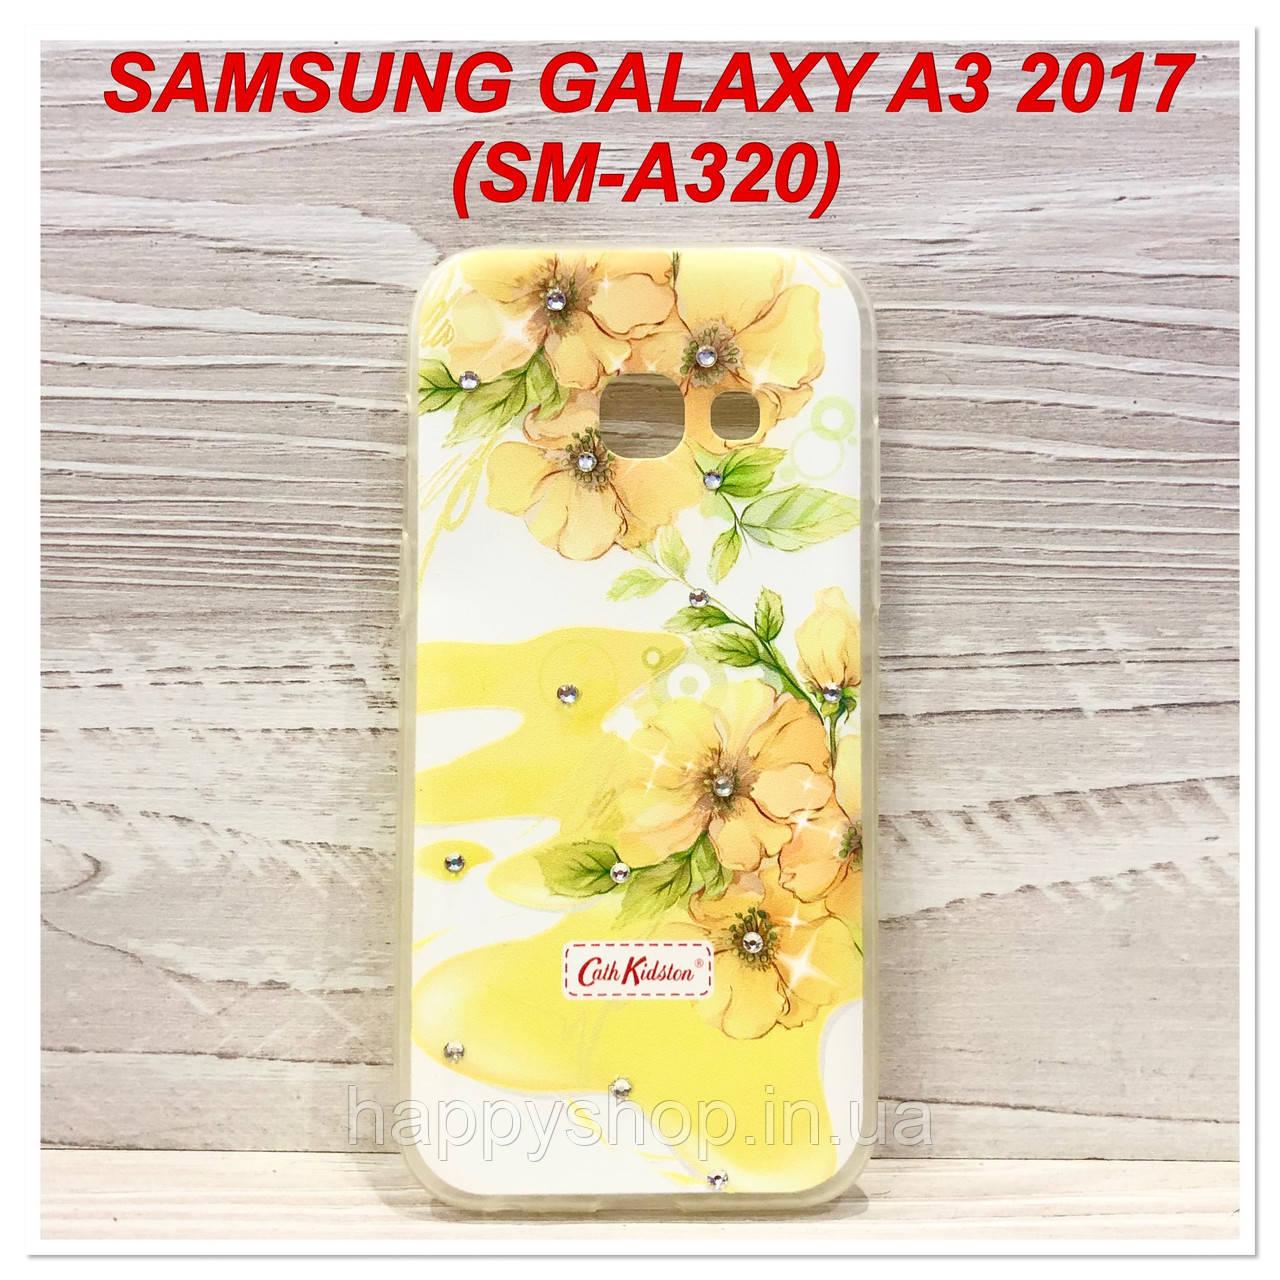 Силіконовий чохол Beckberg для Samsung Galaxy A3 2017 (A320) (Orchid)